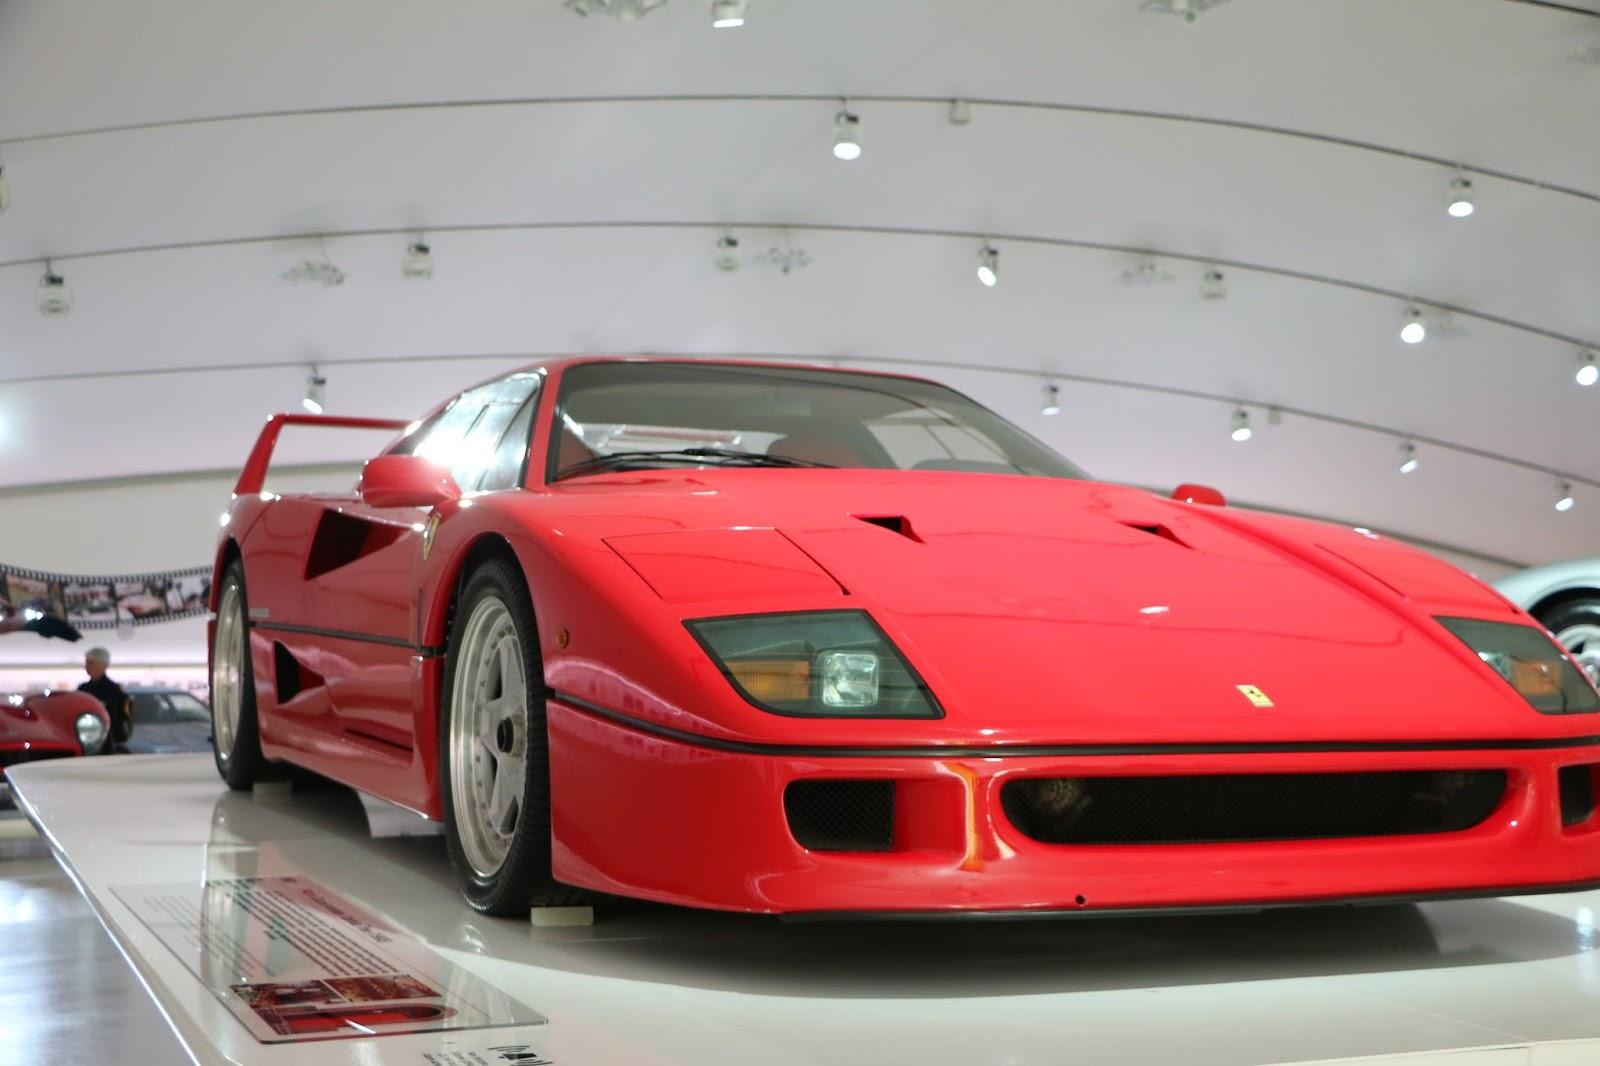 Modena - Enzo Museum 0016 - Ferrari F40.jpg